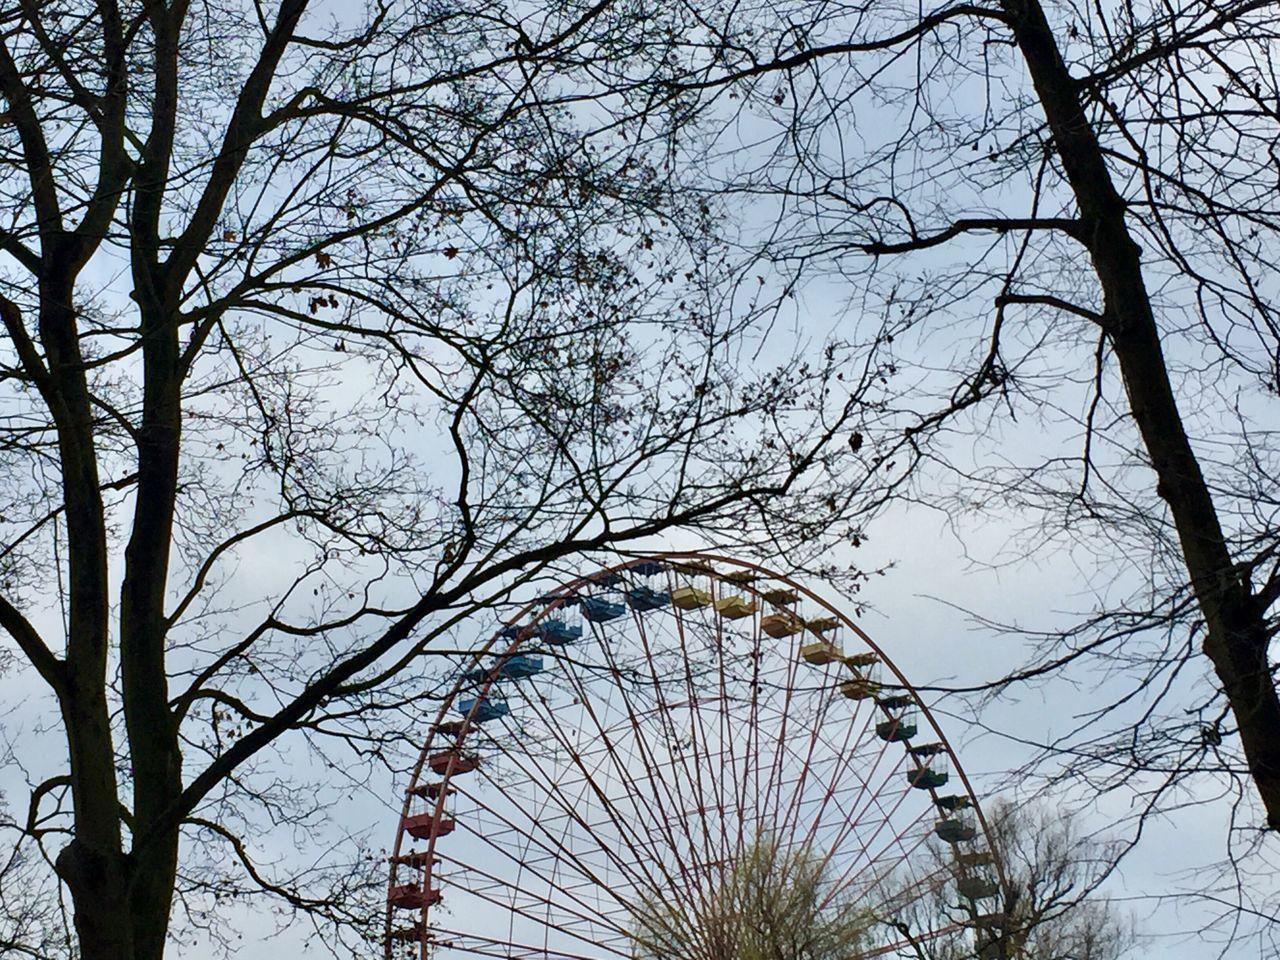 tree, bare tree, branch, sky, amusement park ride, ferris wheel, amusement park, plant, no people, nature, low angle view, arts culture and entertainment, day, architecture, travel destinations, outdoors, clear sky, large, built structure, fairground